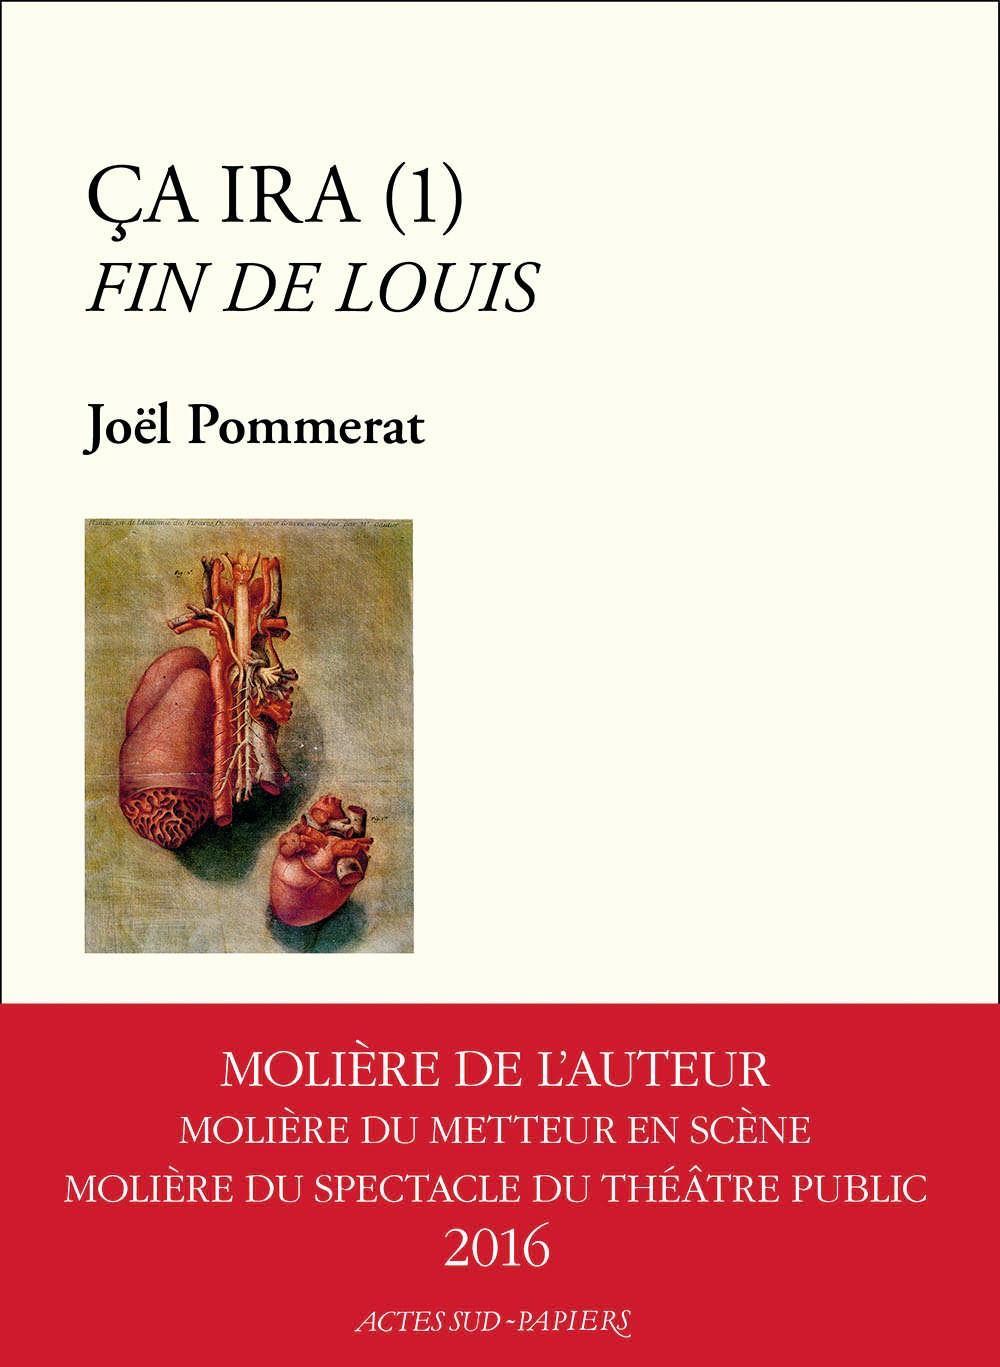 Joël Pommerat, Ça ira (1) Fin de Louis, Actes Sud, 2016.